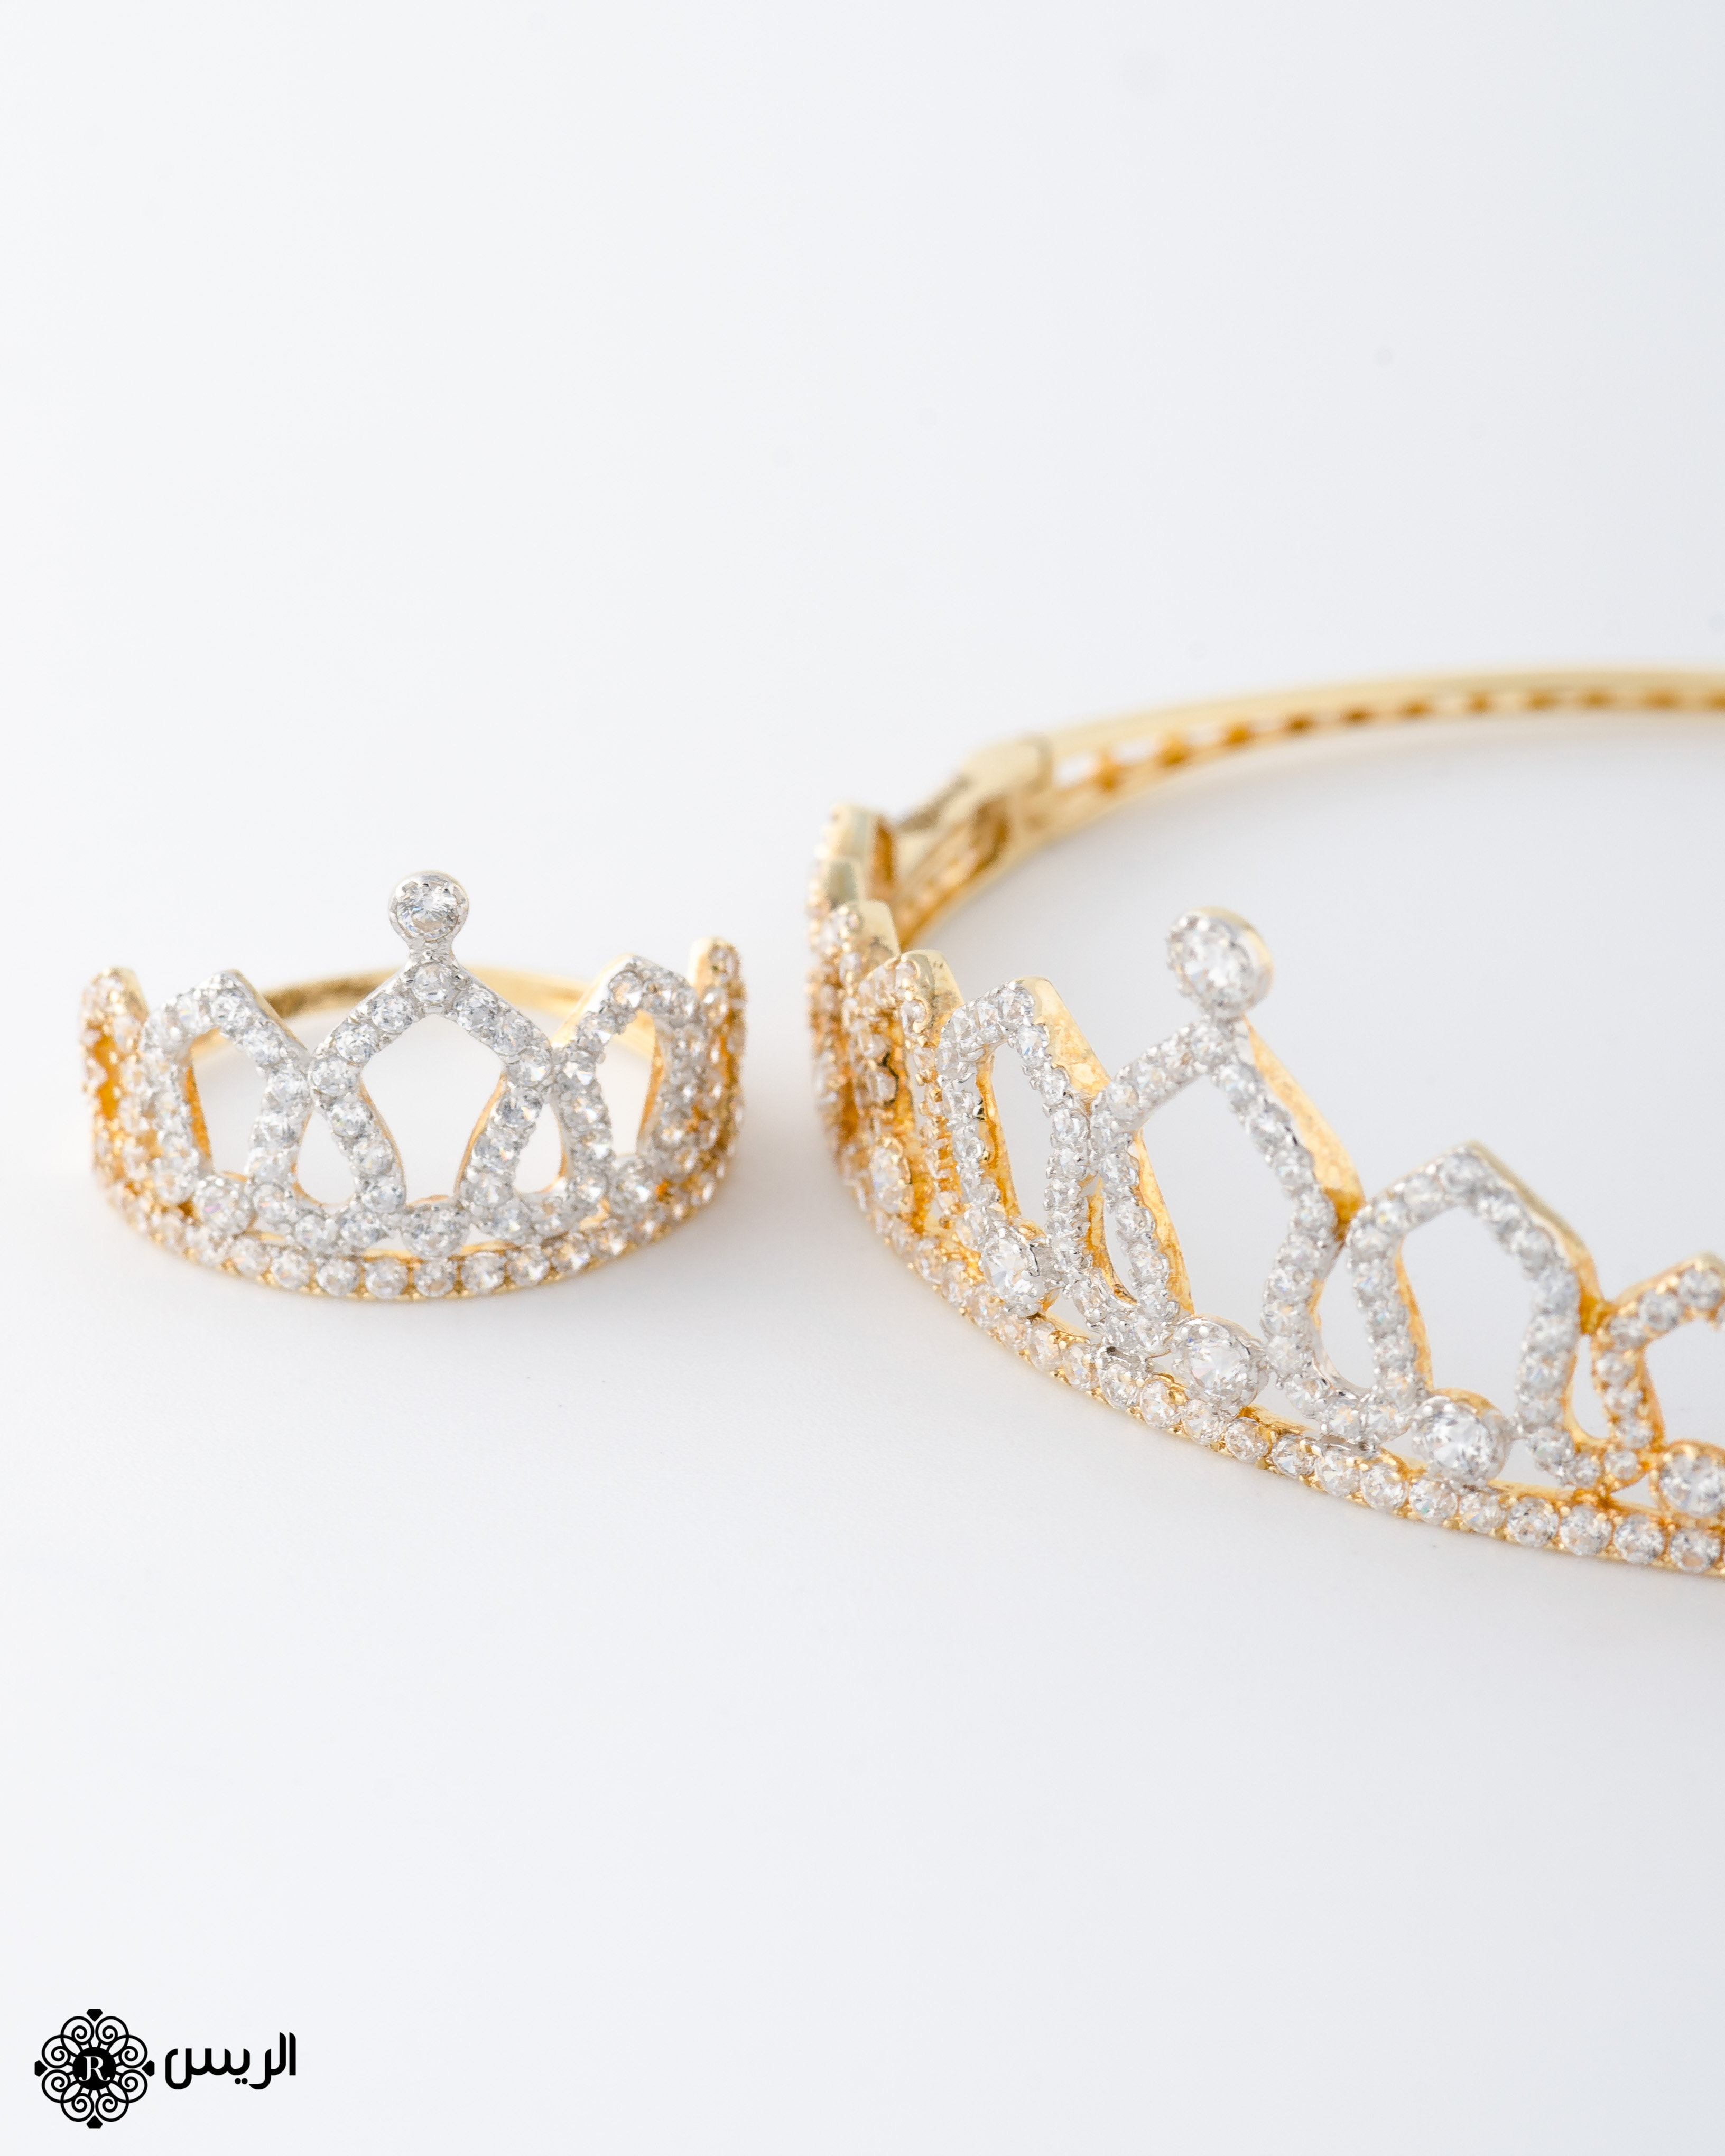 Raies jewelry Bangle Ring Classic Crown Design إسورة تاج مع خاتم تصميم كلاسيكي الريس للمجوهرات